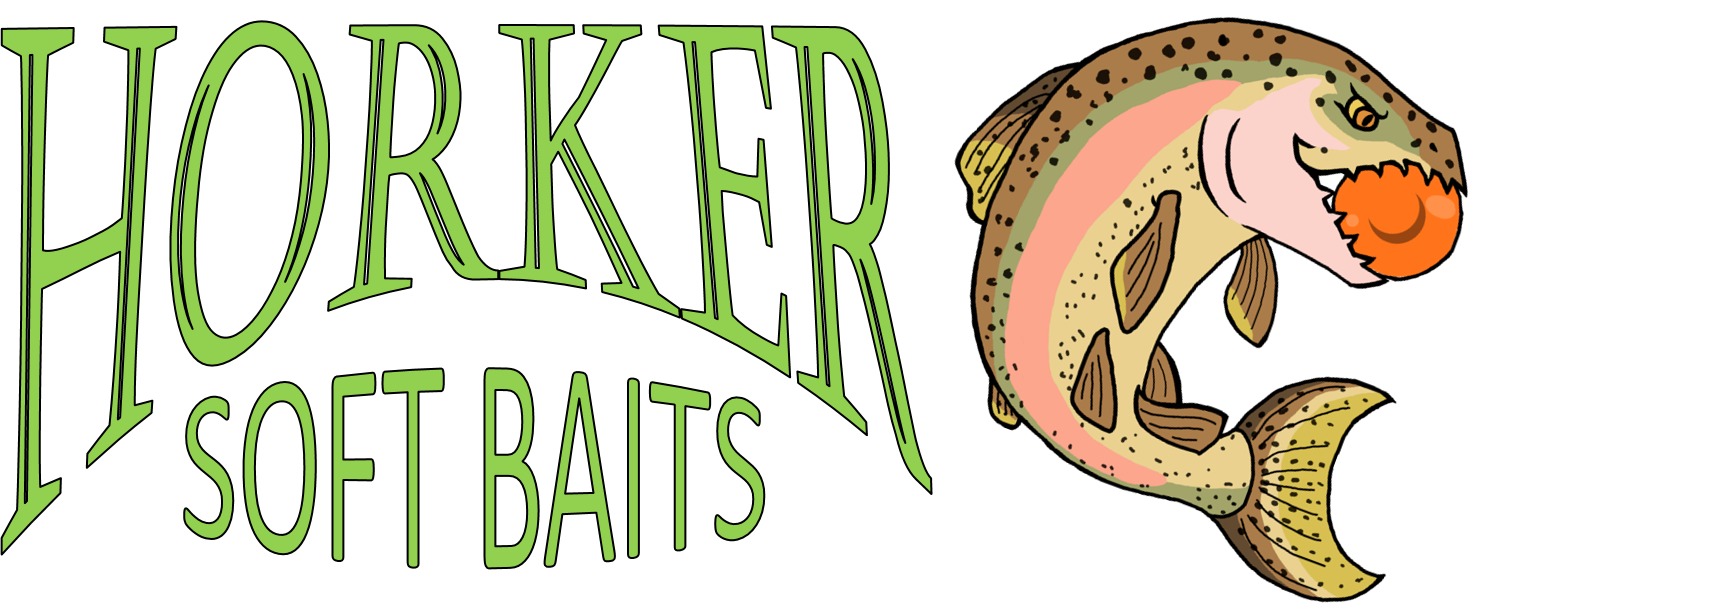 Horker Soft Baits